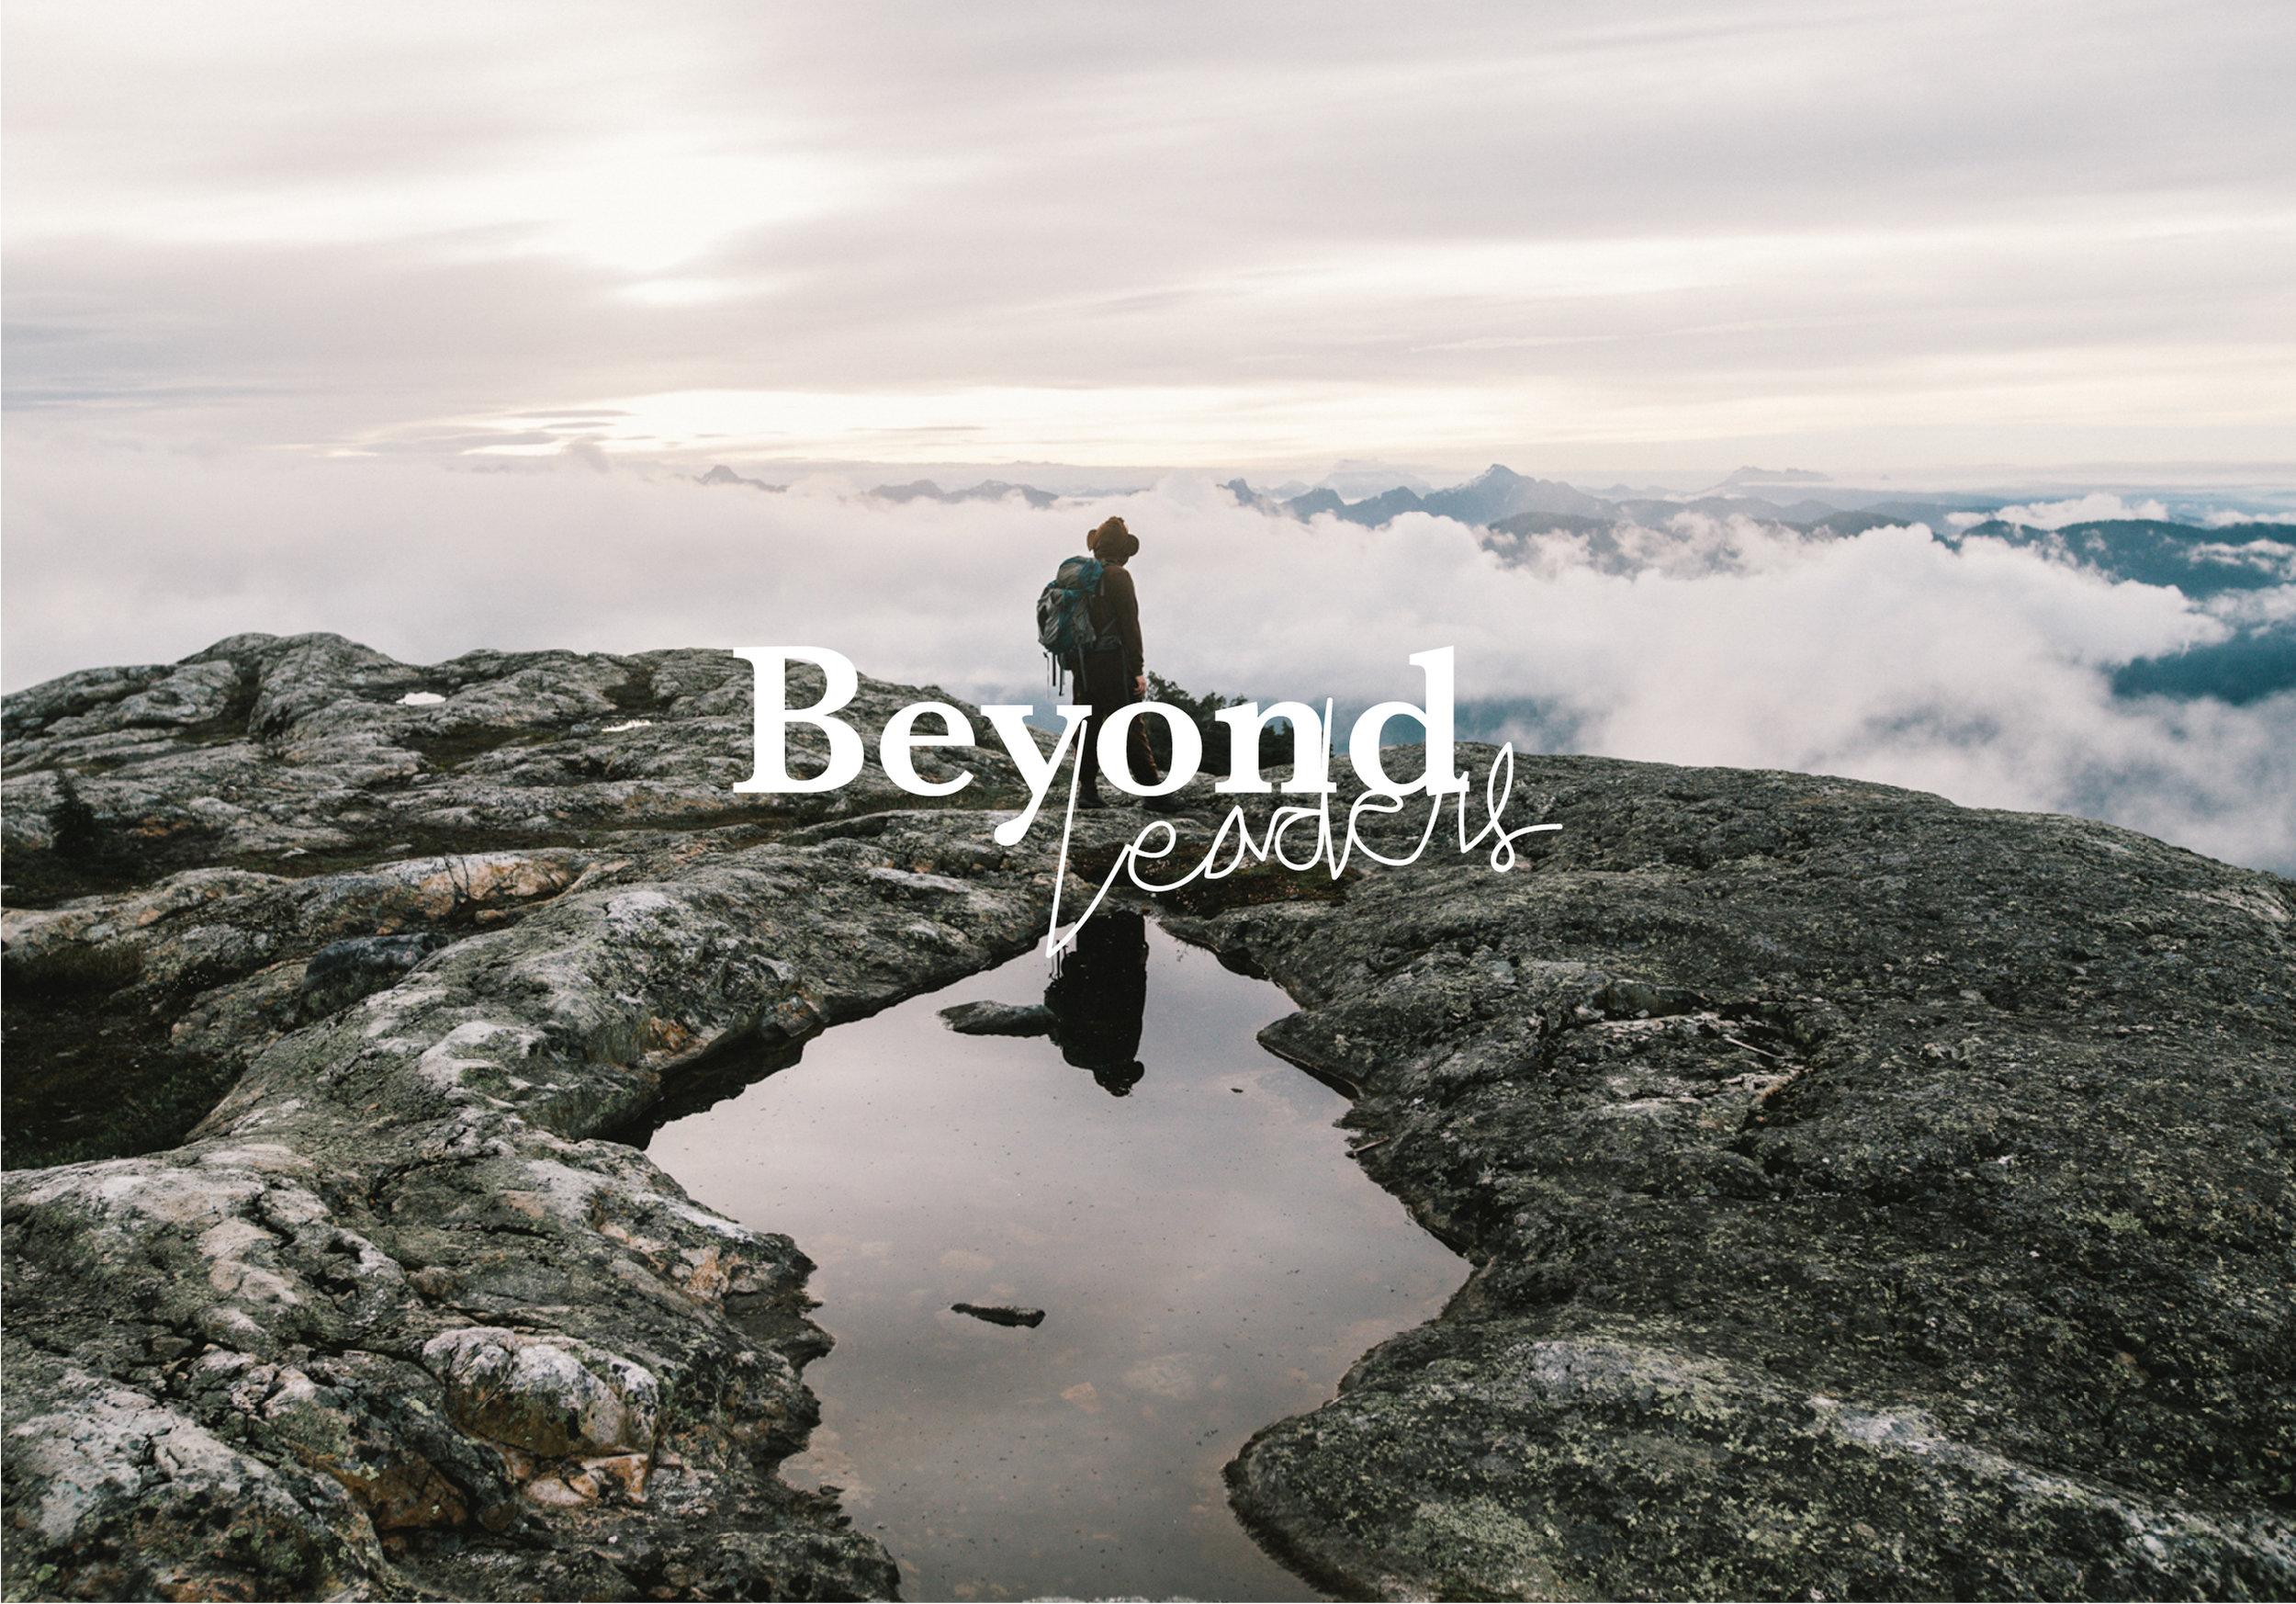 Beyondbannder.jpg